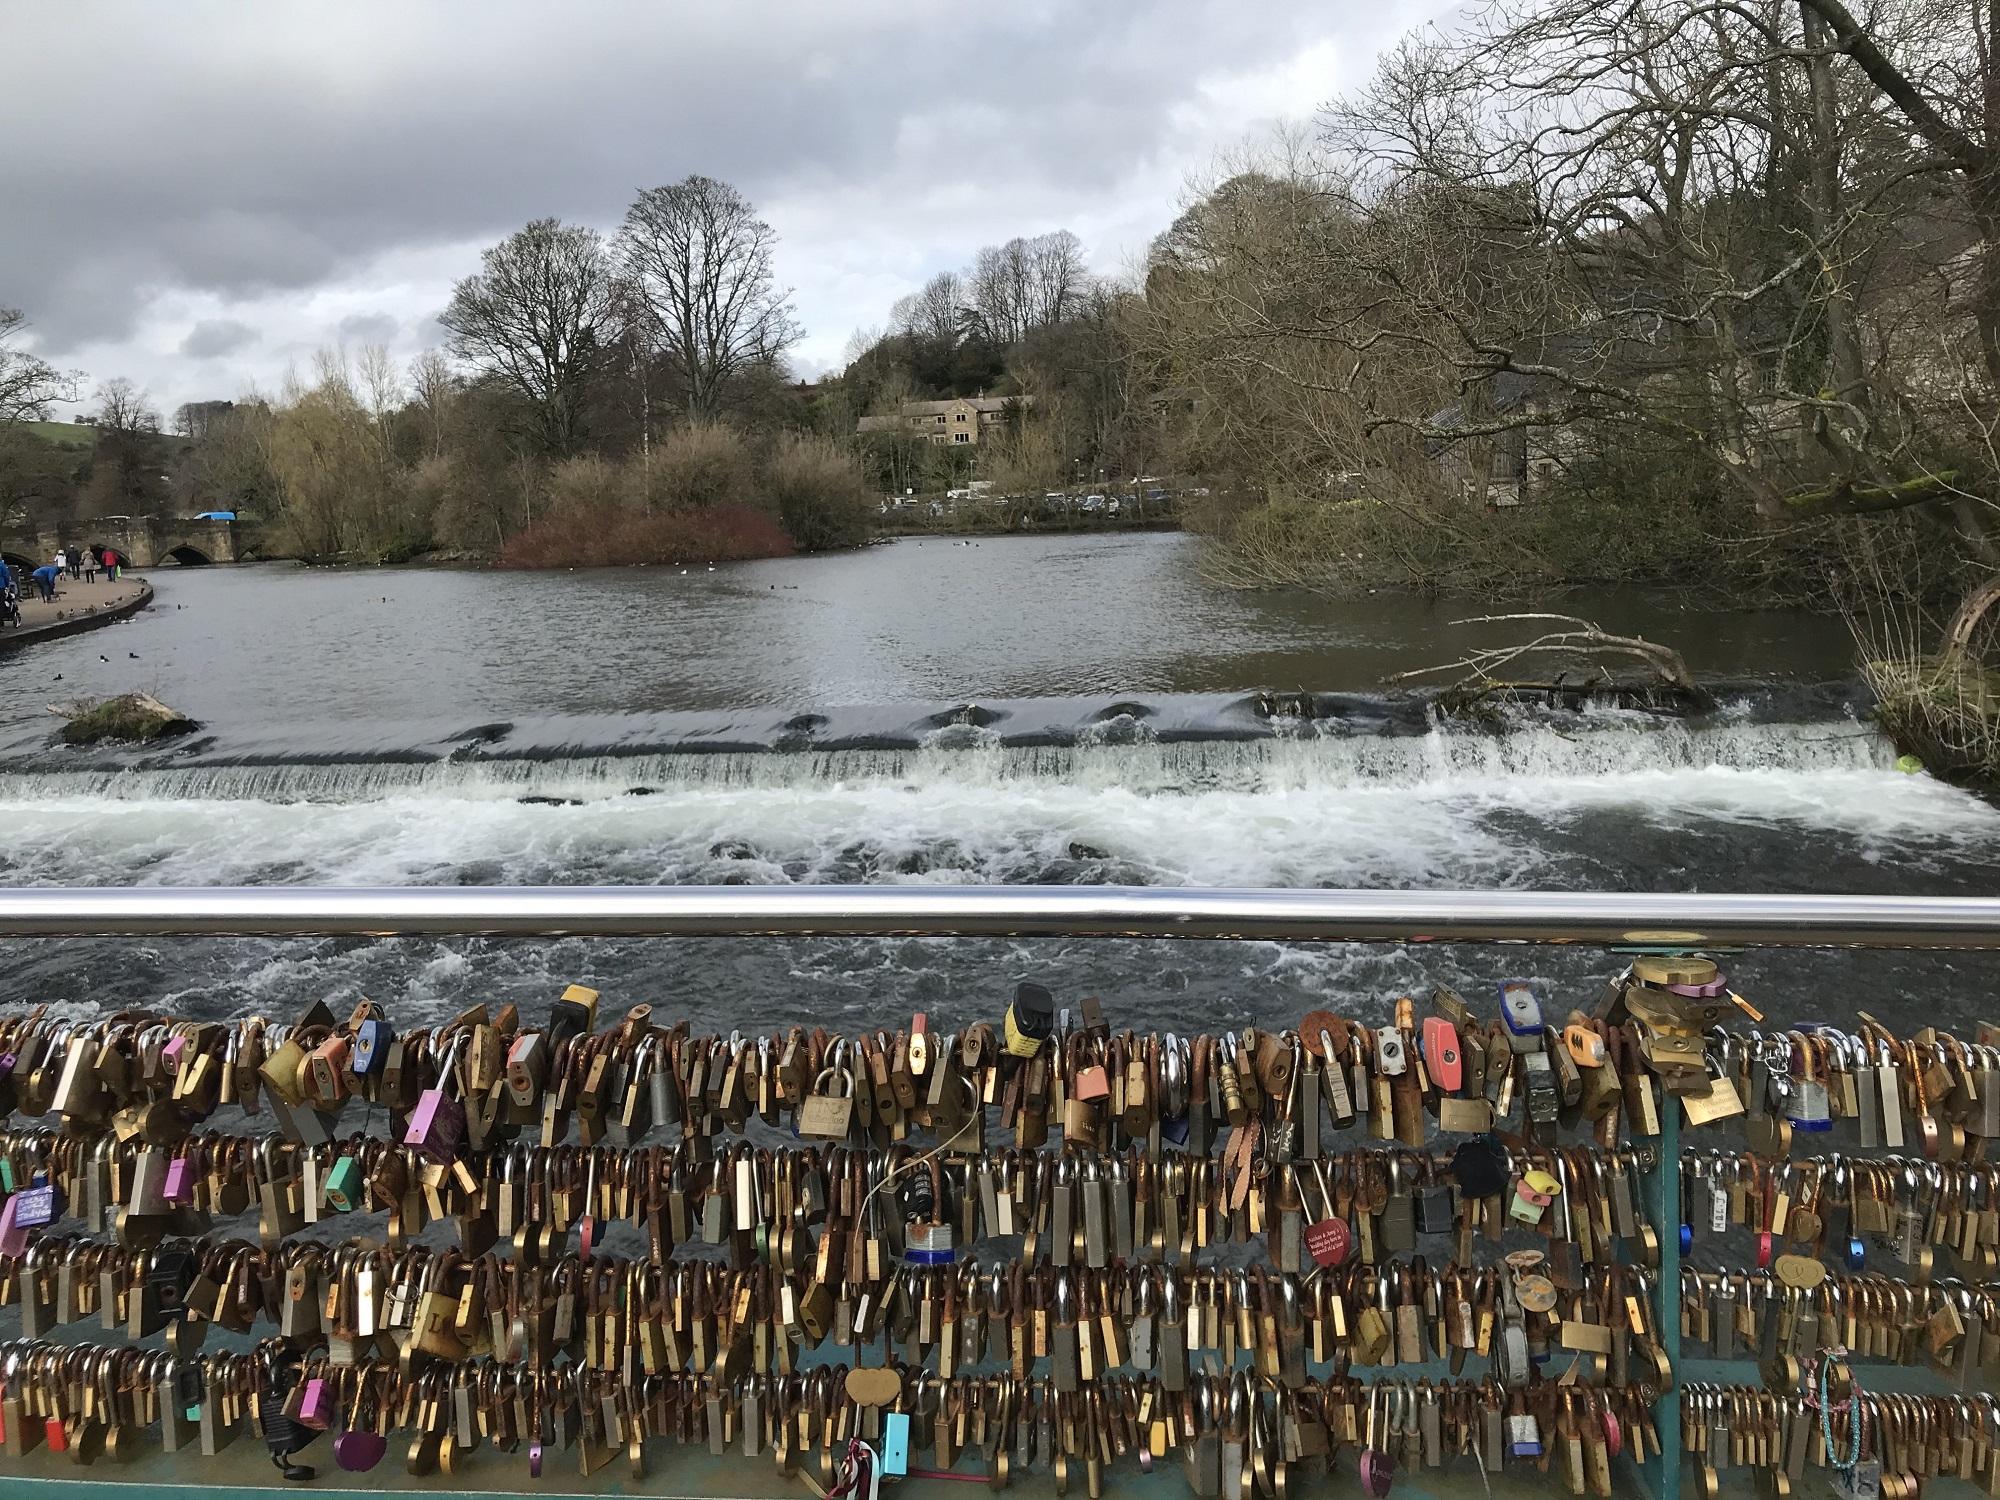 Colourful padlocks span a bridge